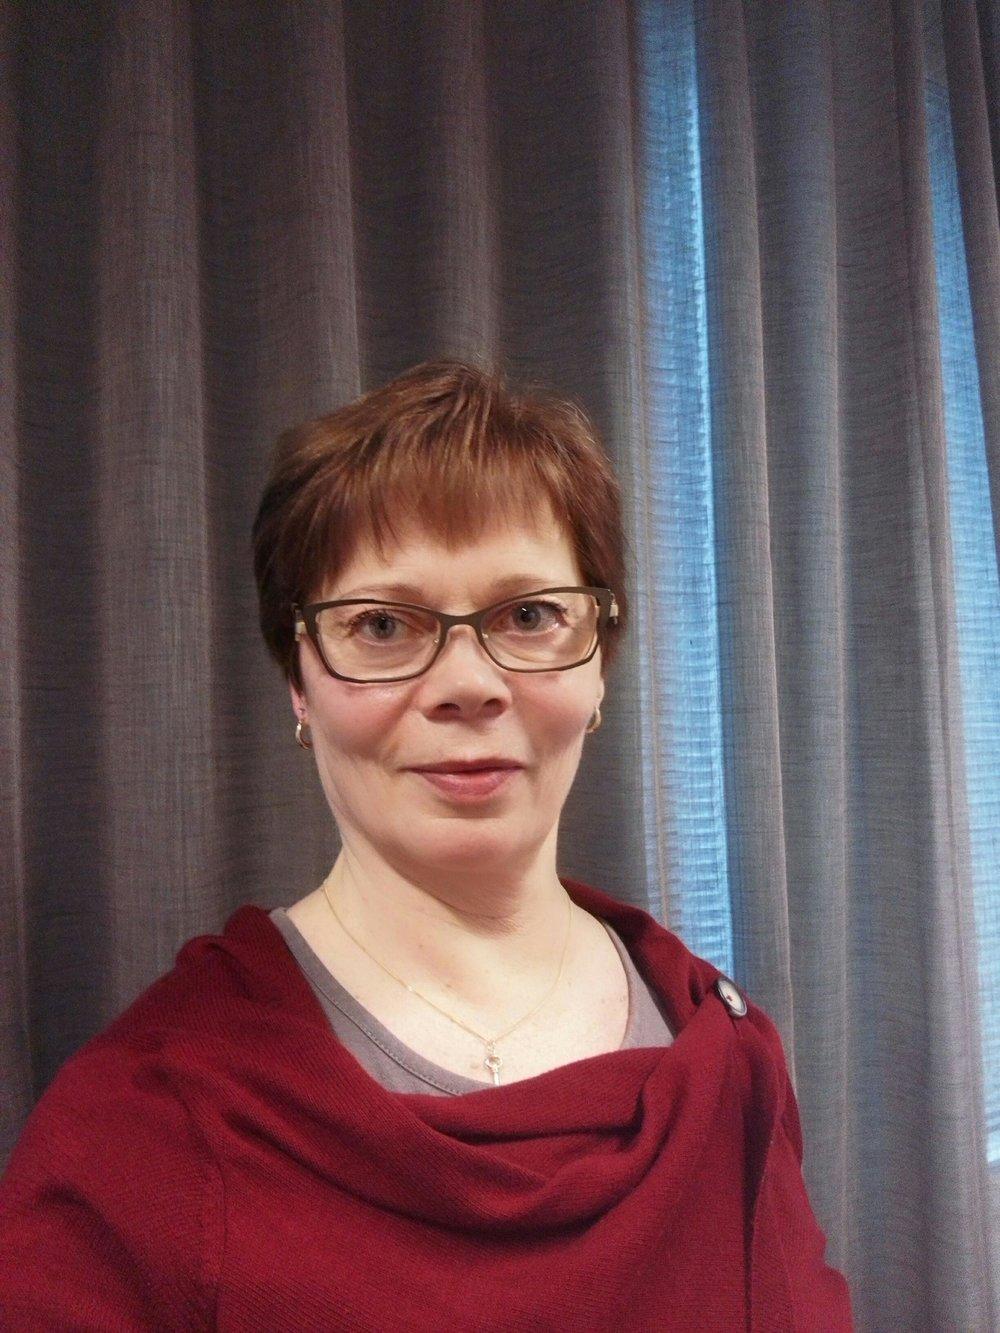 Lea Kröger